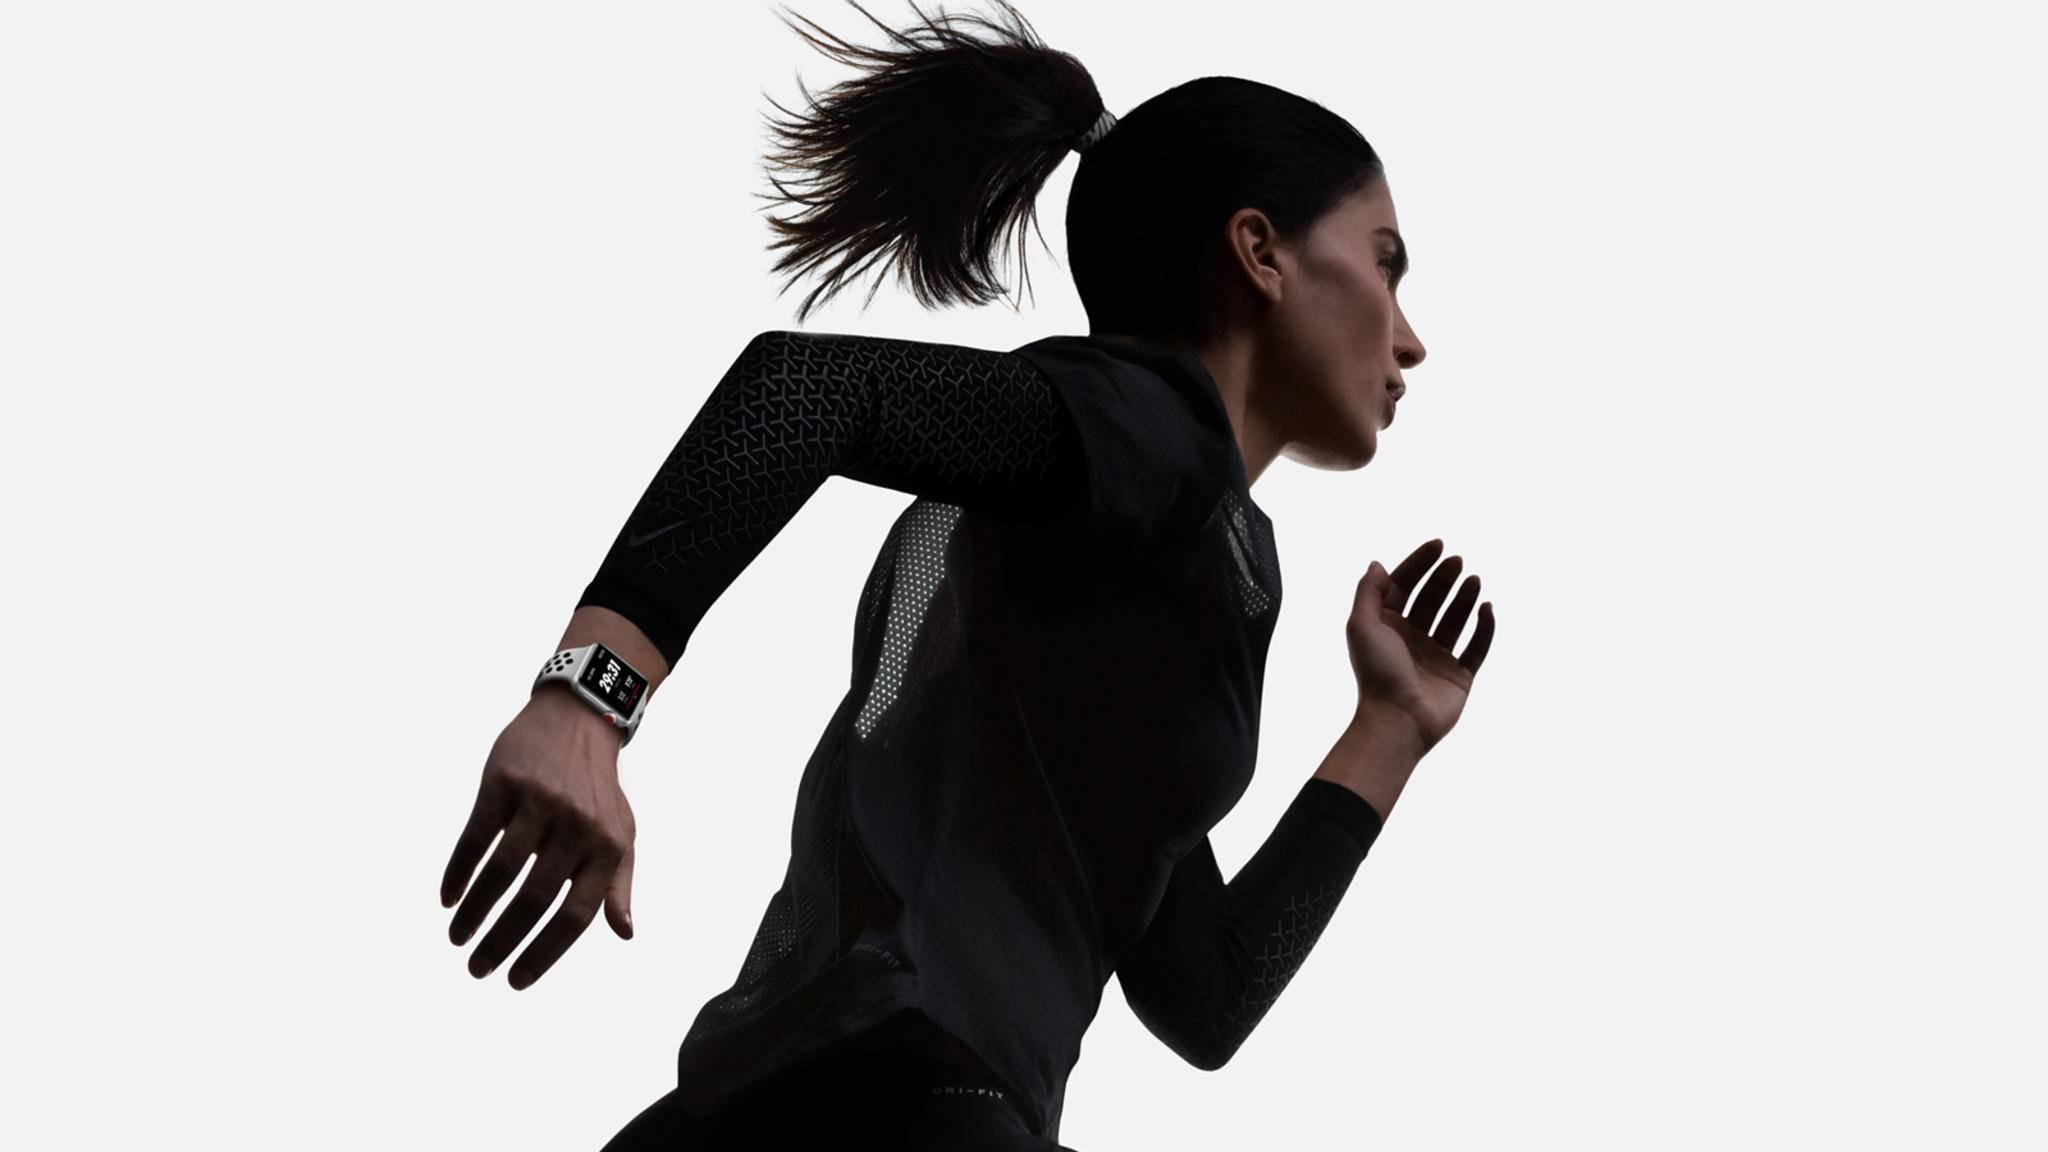 Dank GymKit soll die Apple Watch 3 zum optimalen Indoor-Tracker werden.